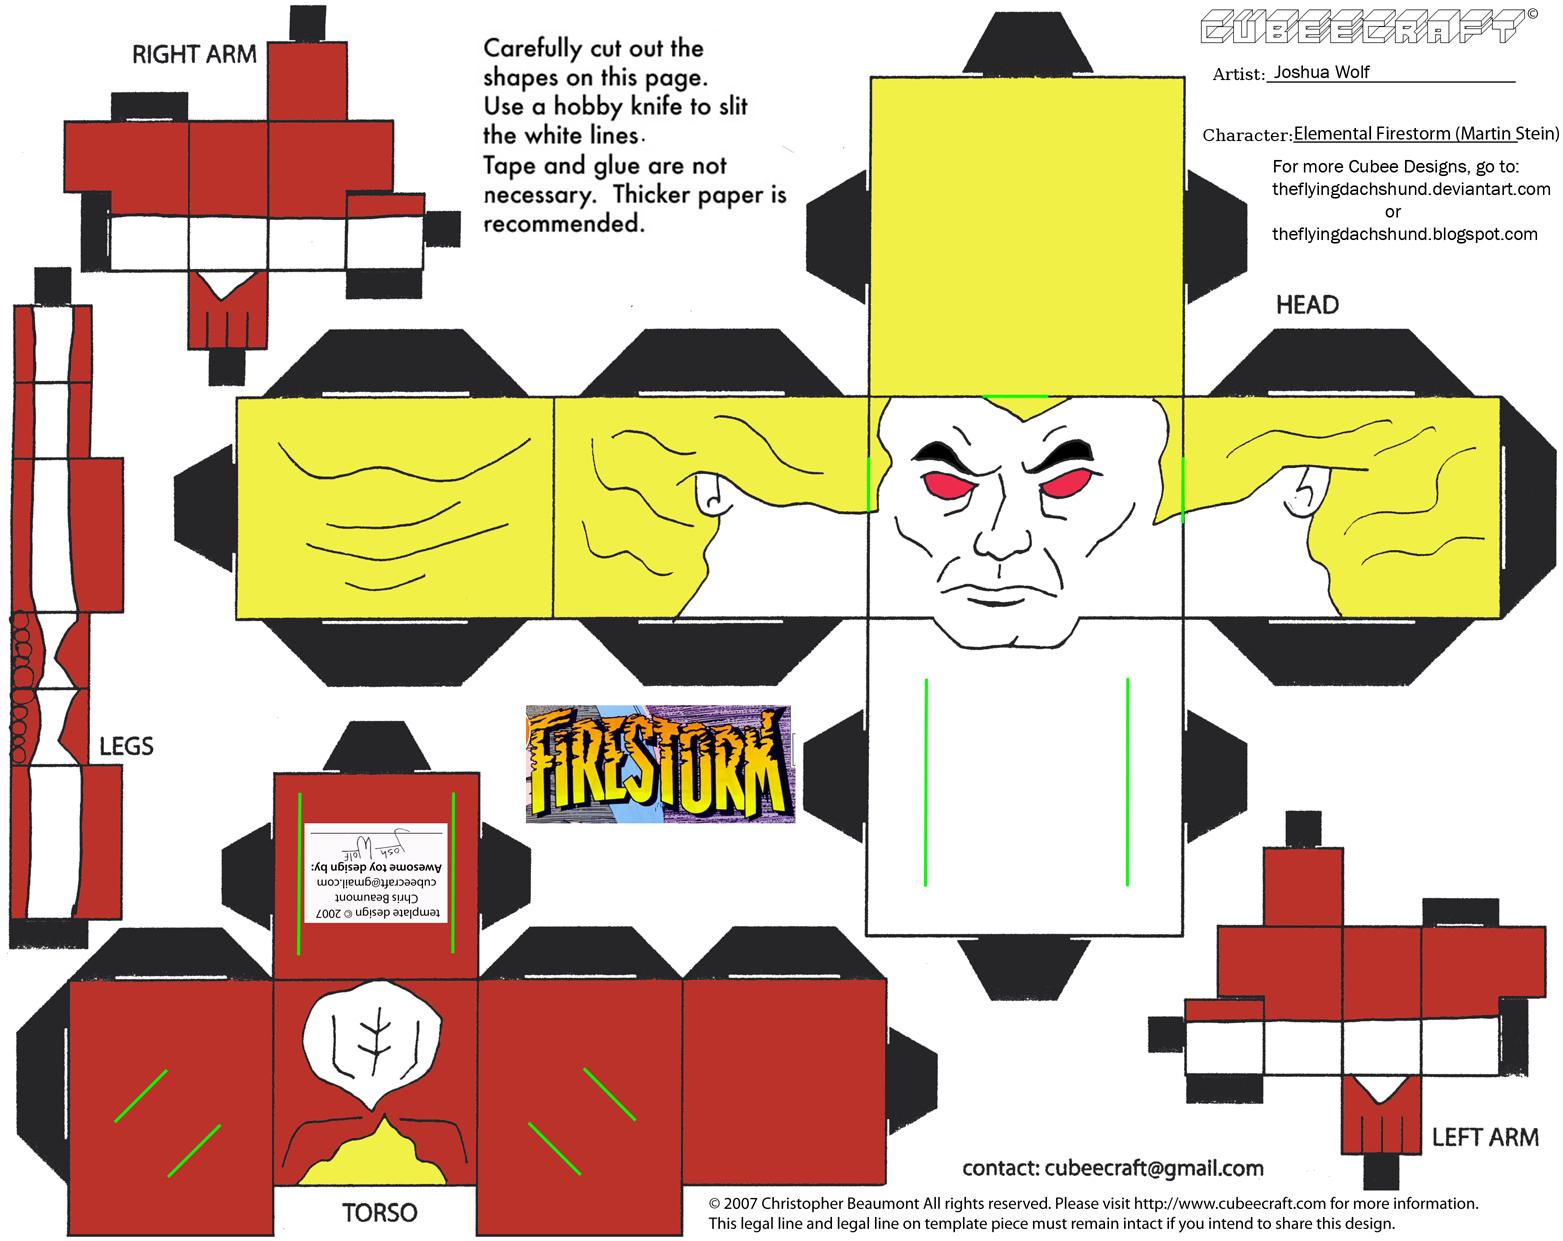 DC SH36: Elemental Firestorm Cubee